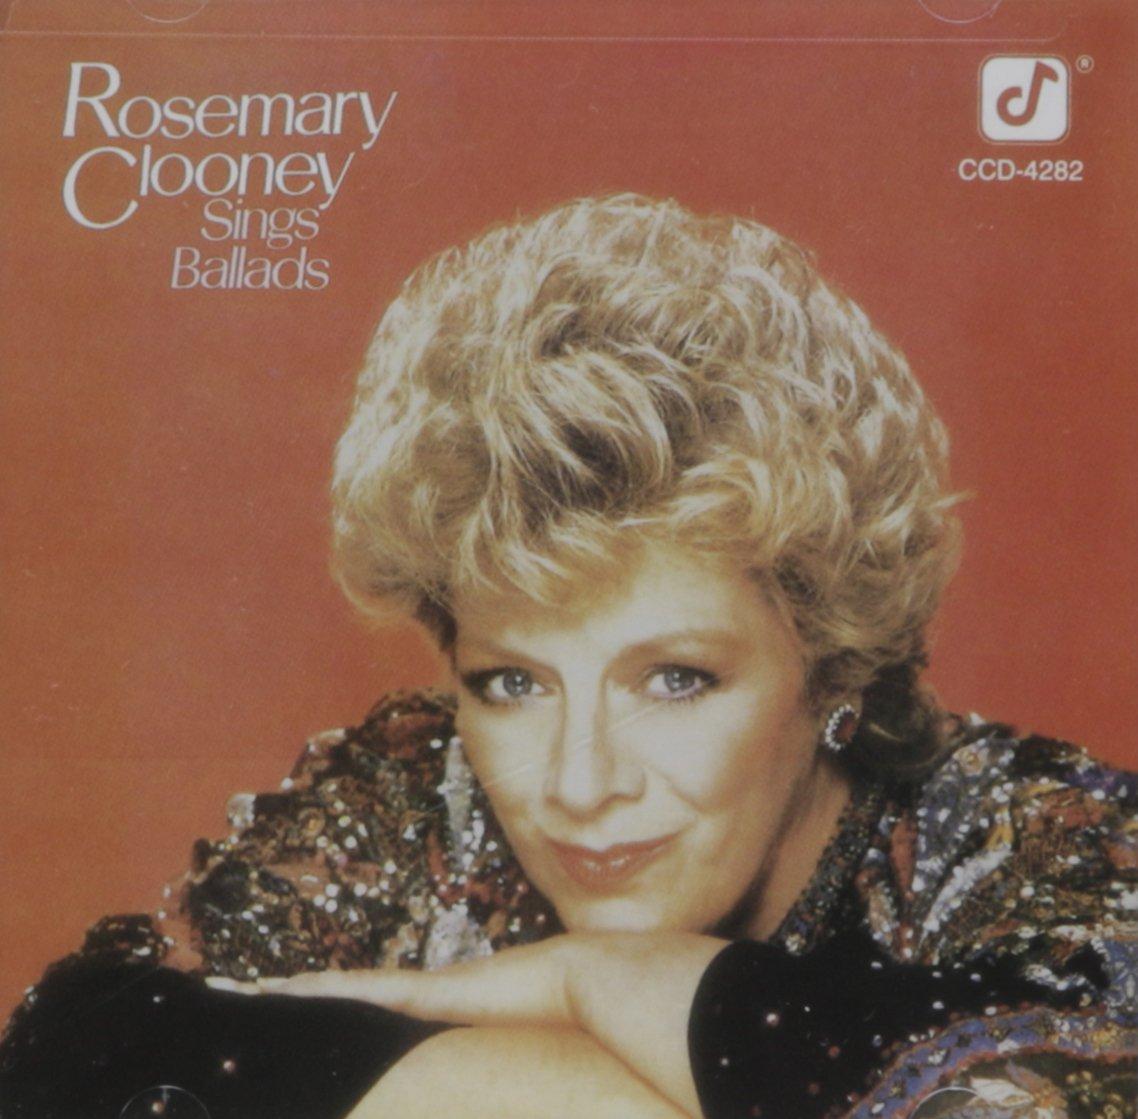 Rosemary Clooney - Rosemary Clooney Sings Ballads - Amazon.com Music